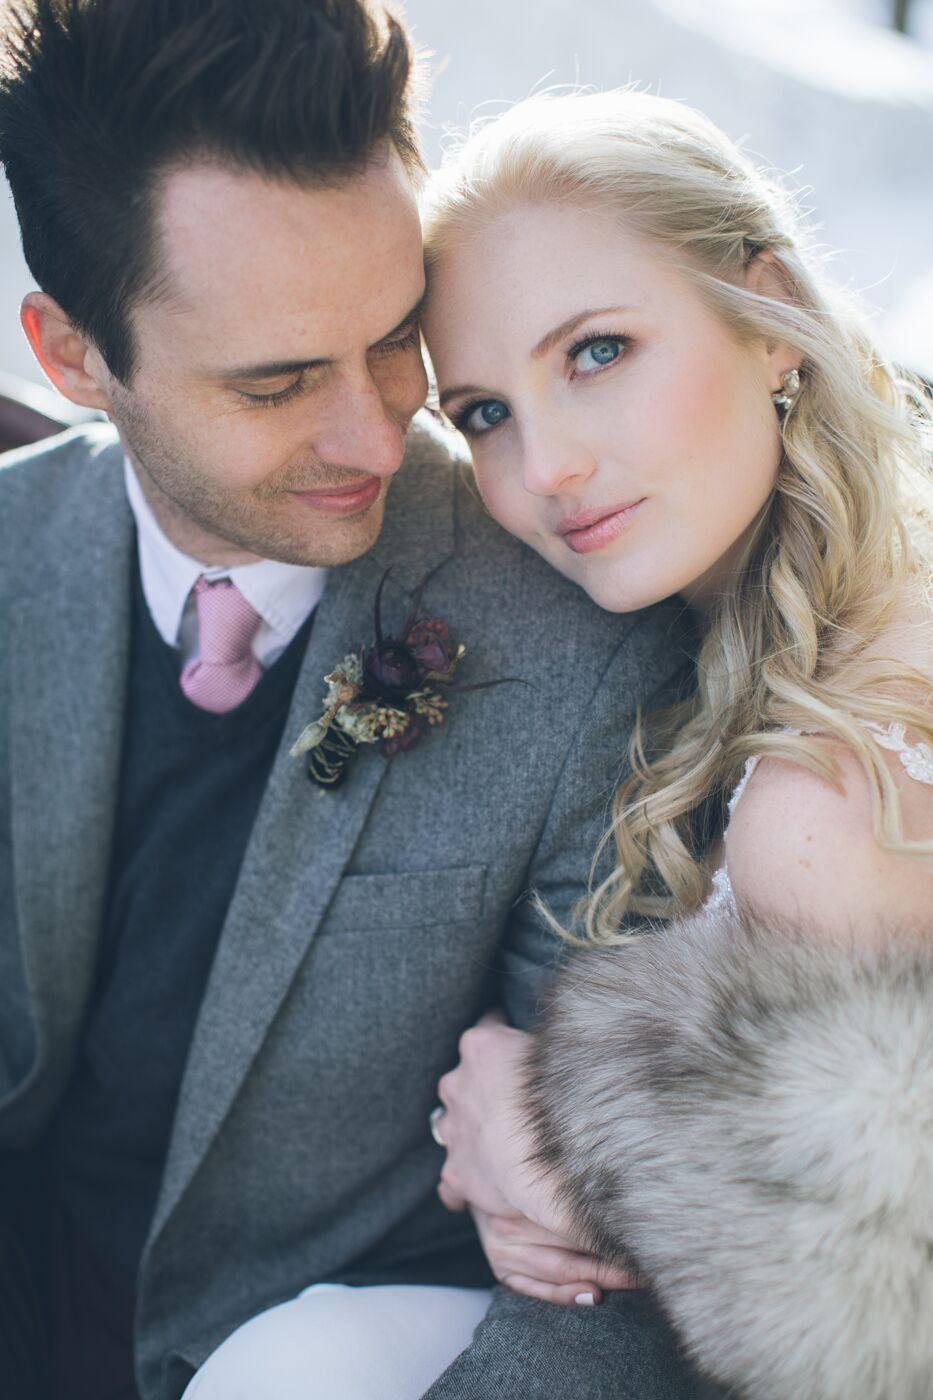 aniko-photography-mt-hood-bnb-wedding-77_preview.jpeg